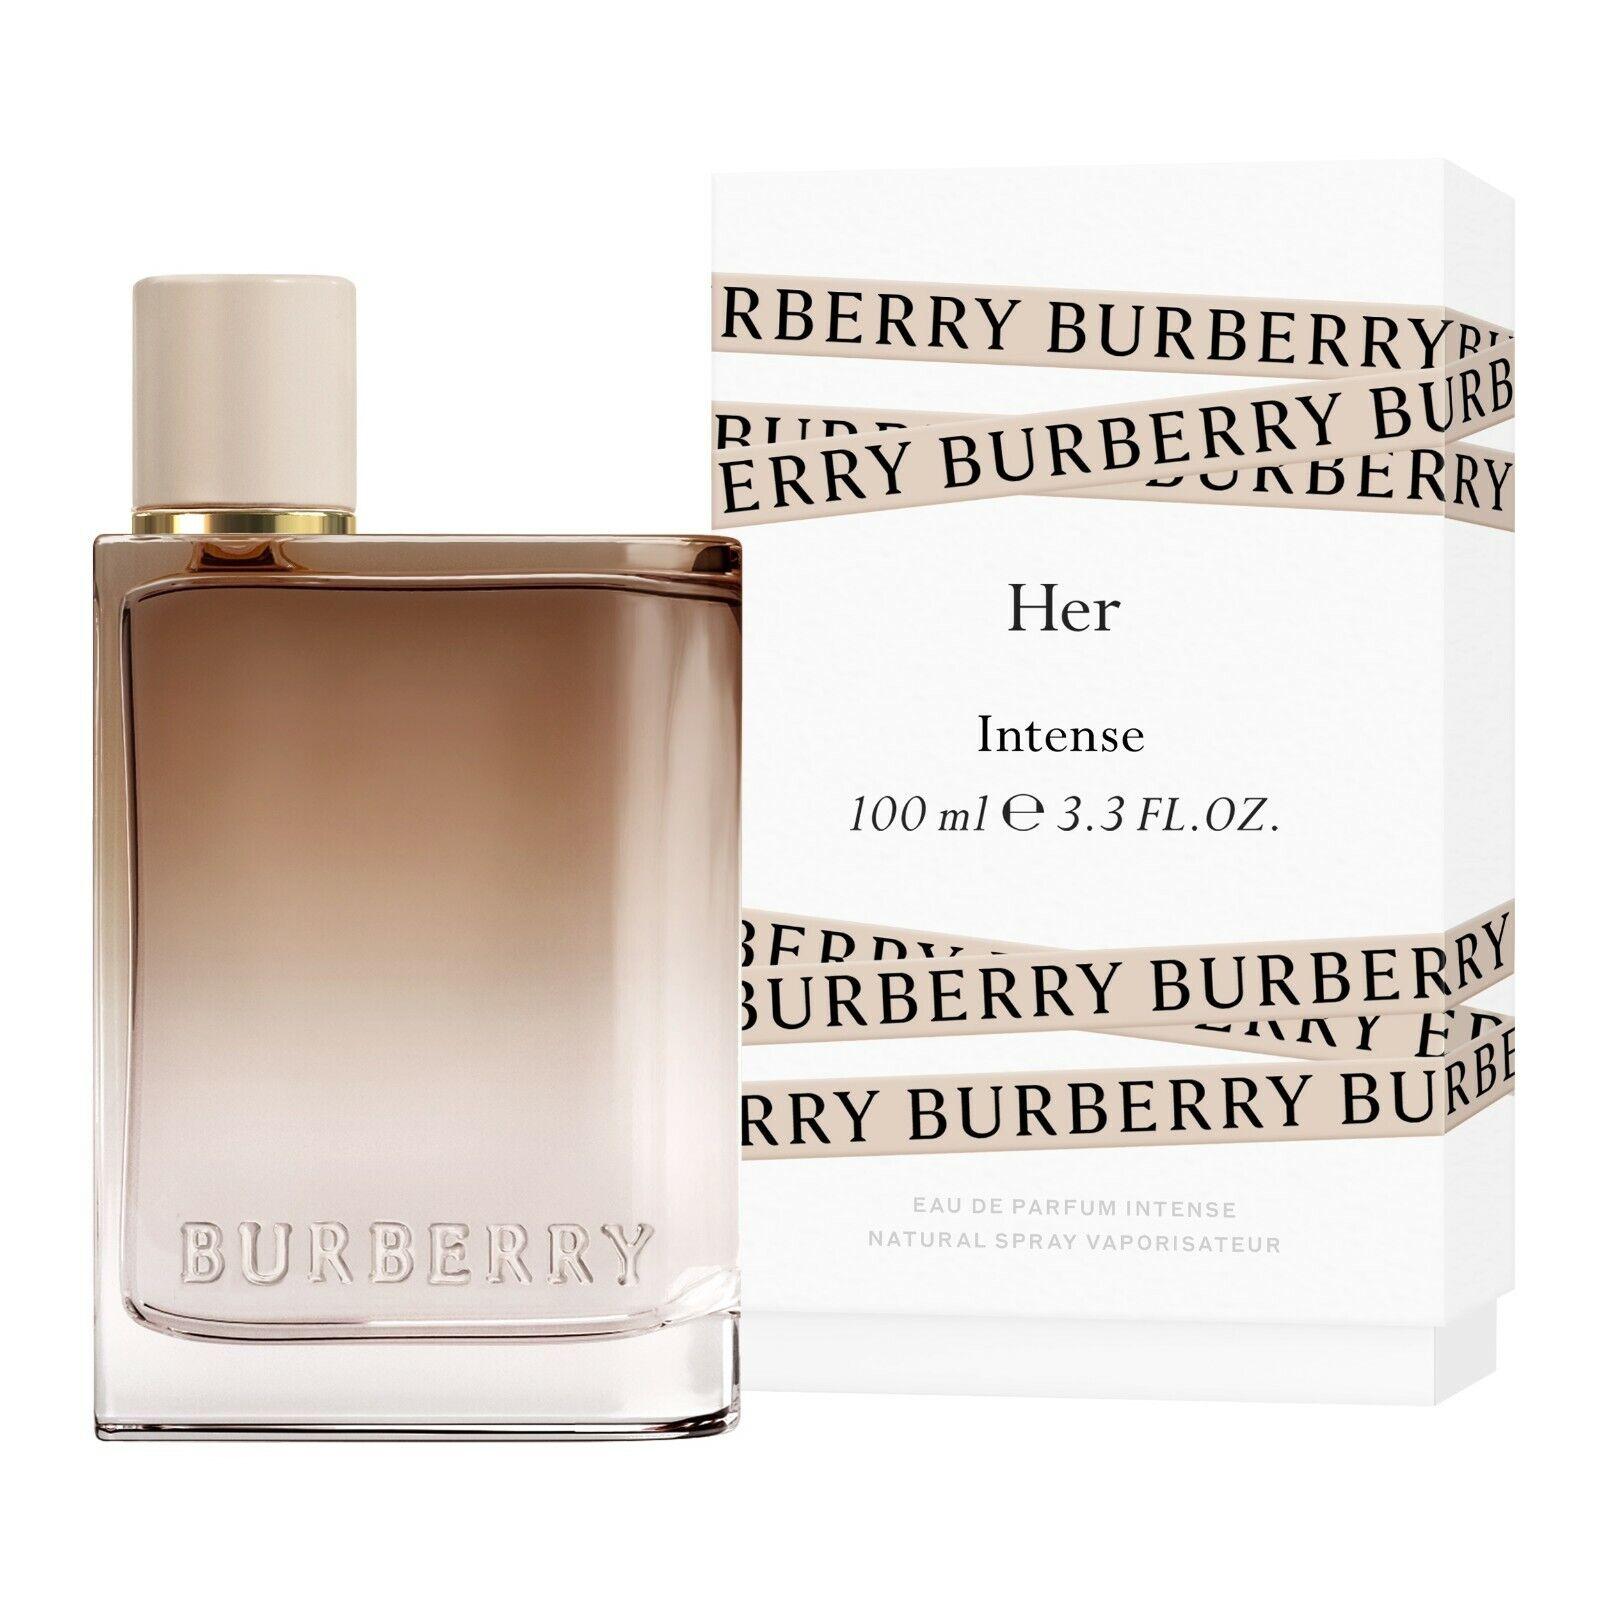 BURBERRY HER INTENSE EDP NAT.SPRAY 100 ml e 3.3 FL.OZ - BRAND NEW 100% AUTHENTIC